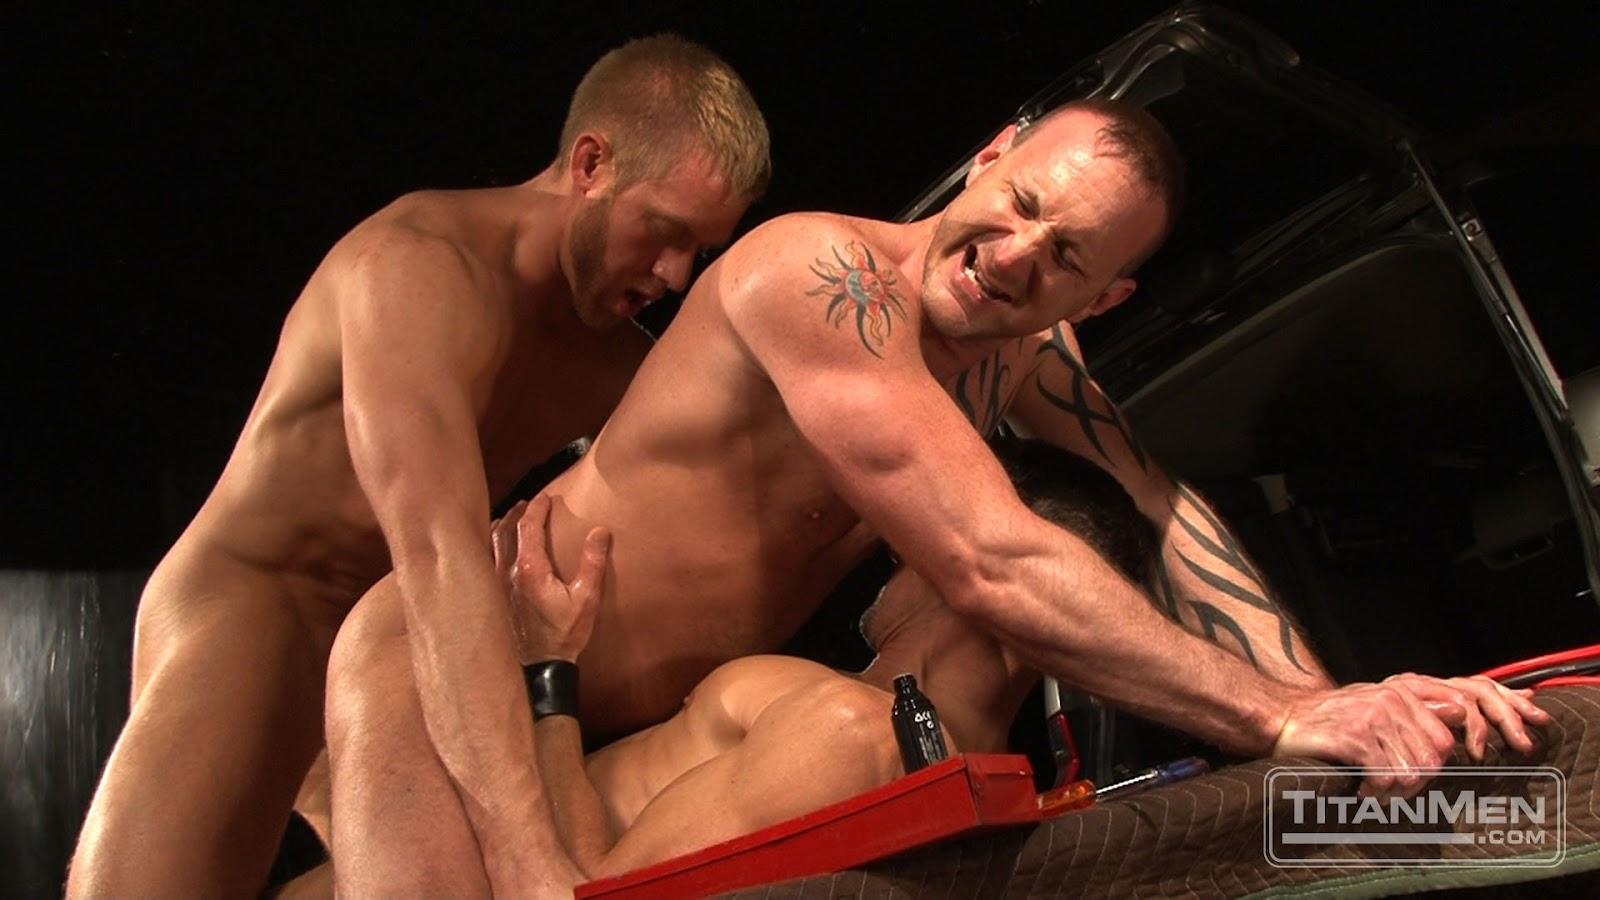 gay men cumming vids